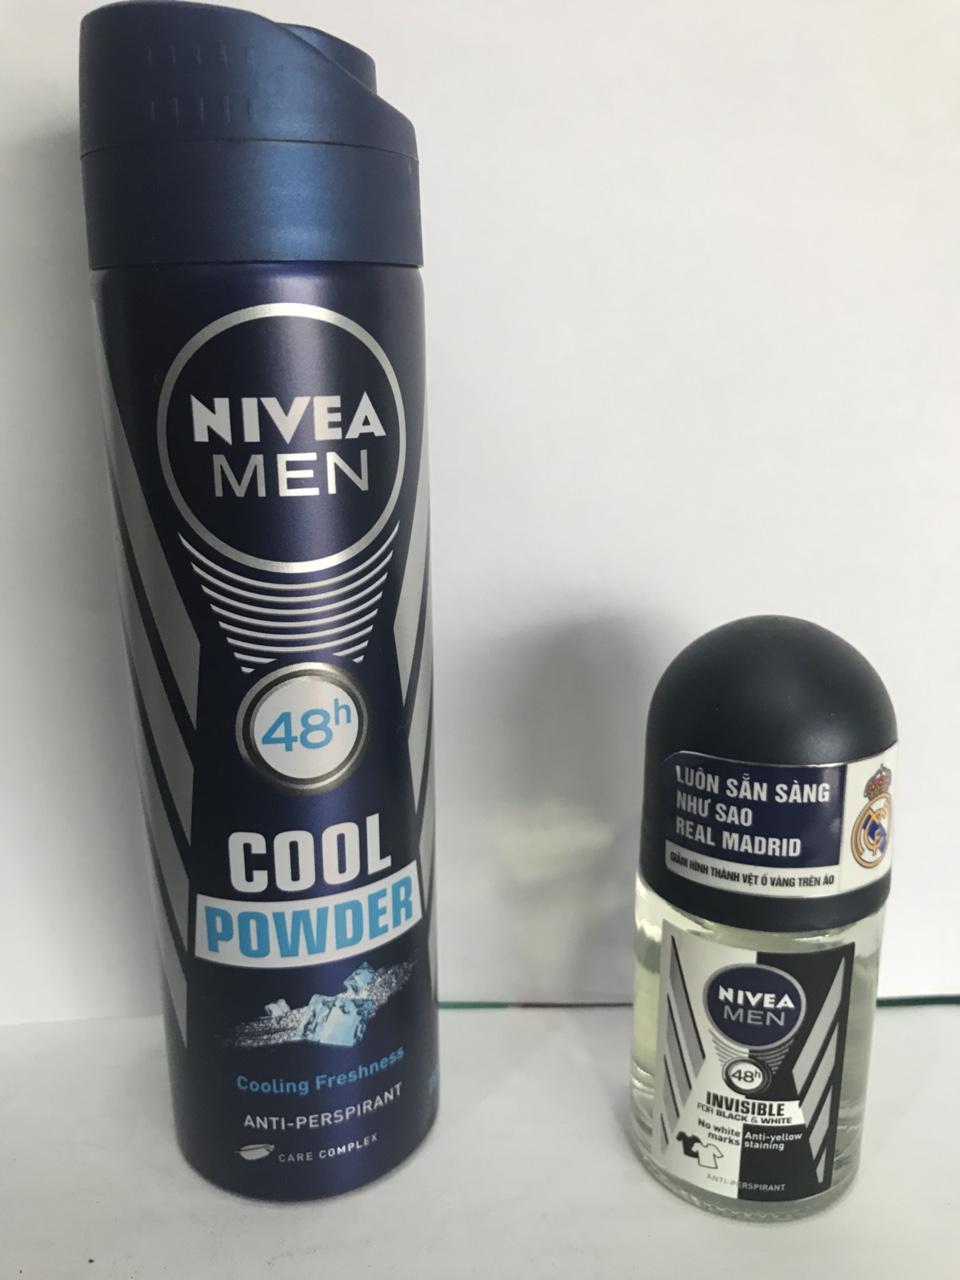 Xịt Khử mừi nivea cool power 150ml tặng lăn khử mùi Nivea men 12ml